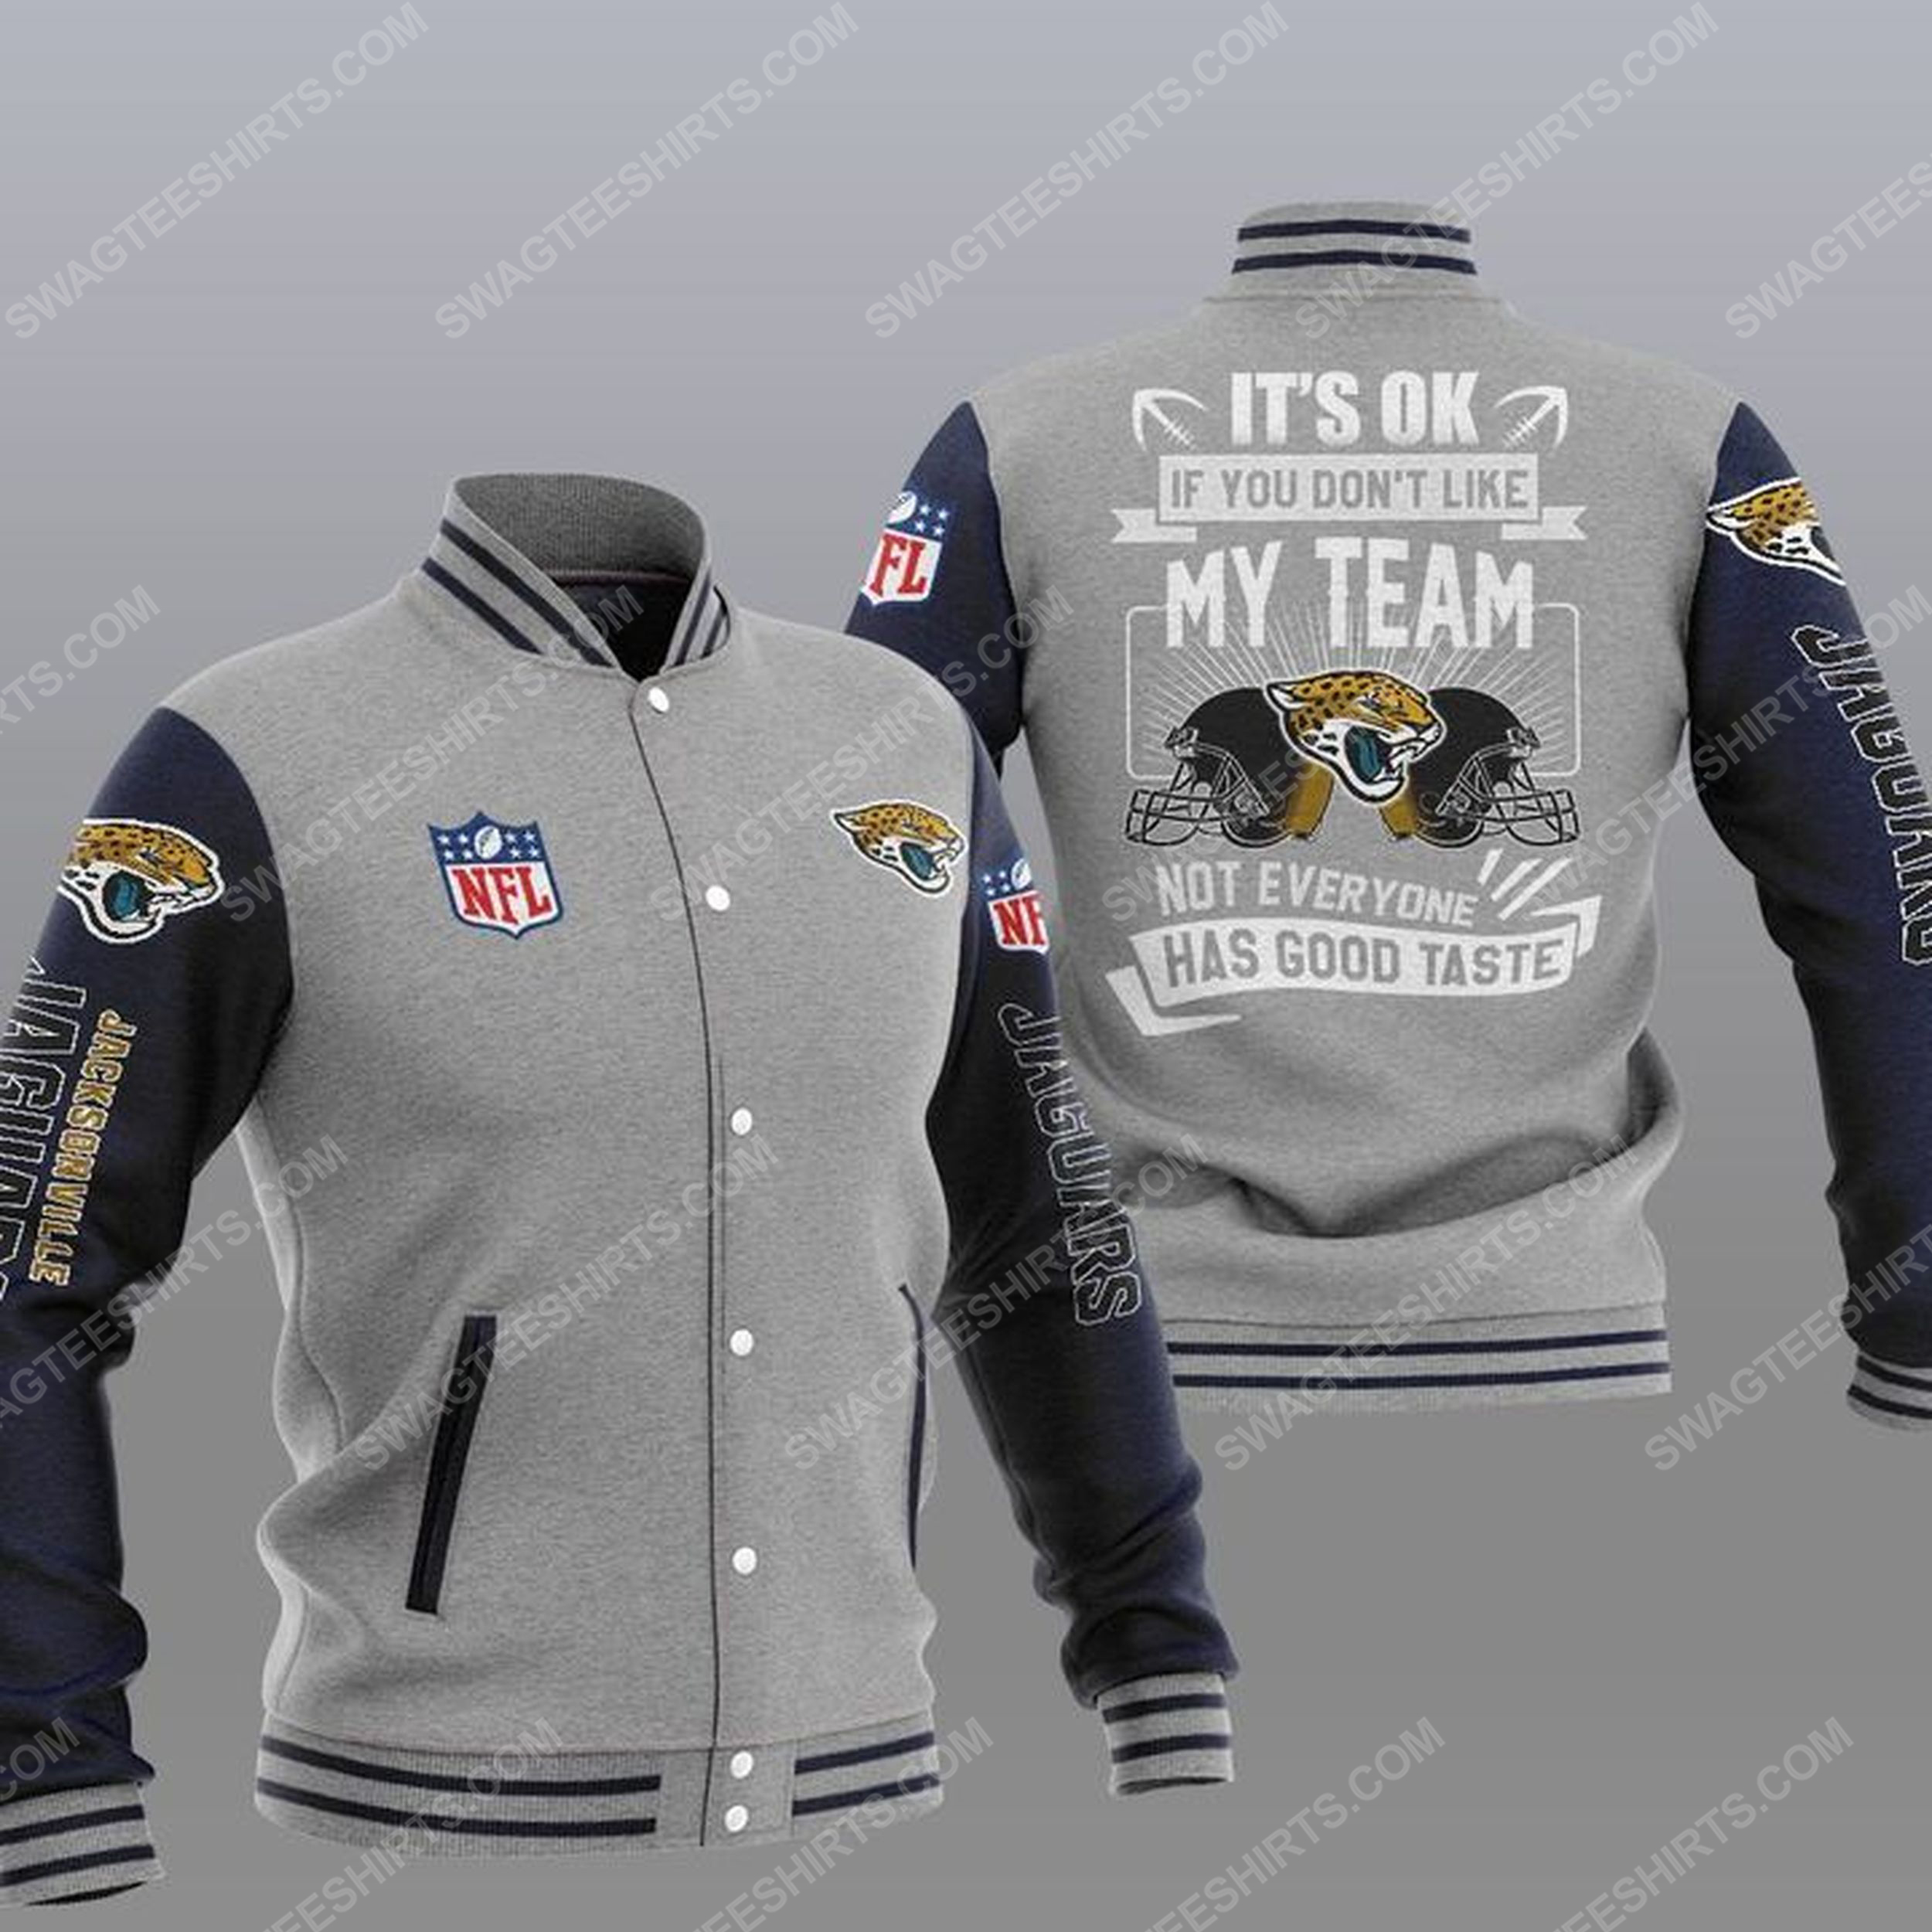 It's ok if you don't like my team jacksonville jaguars all over print baseball jacket - gray 1